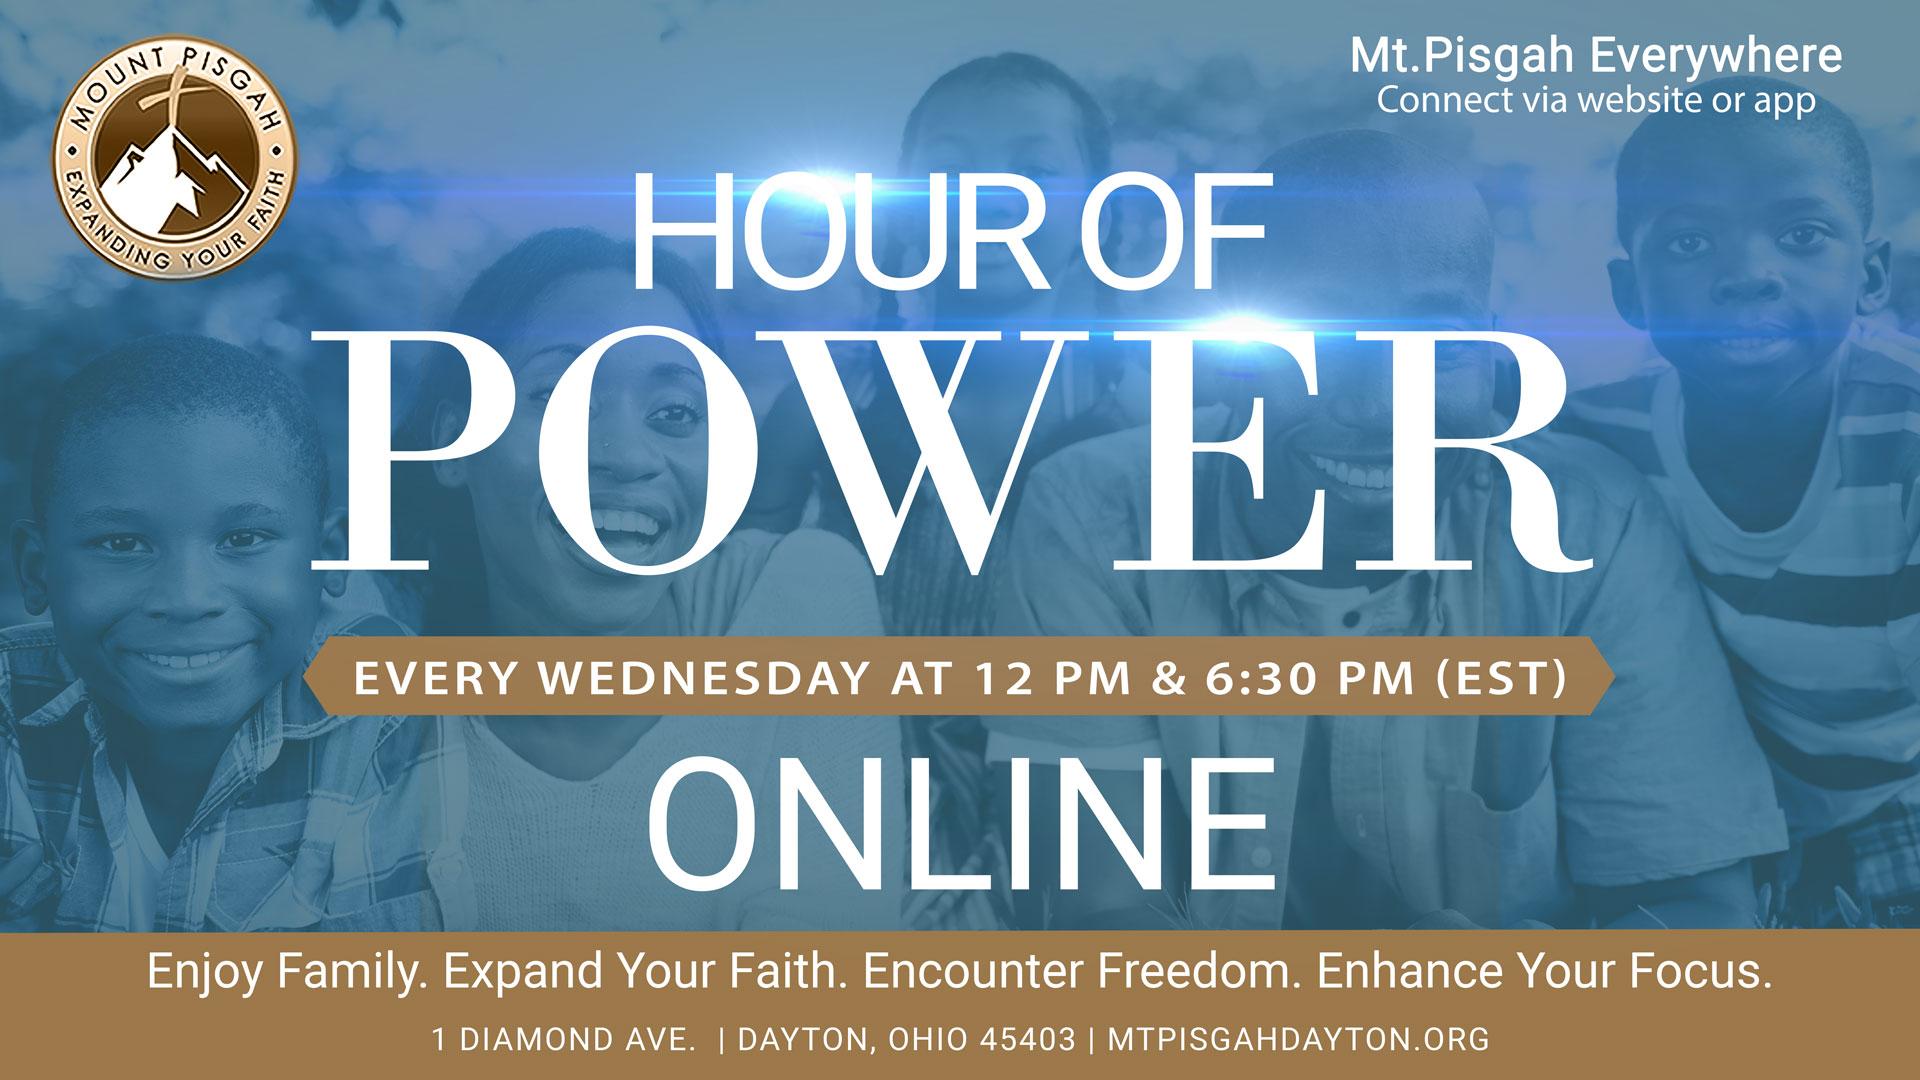 MT Pisgah - Hour Of Power